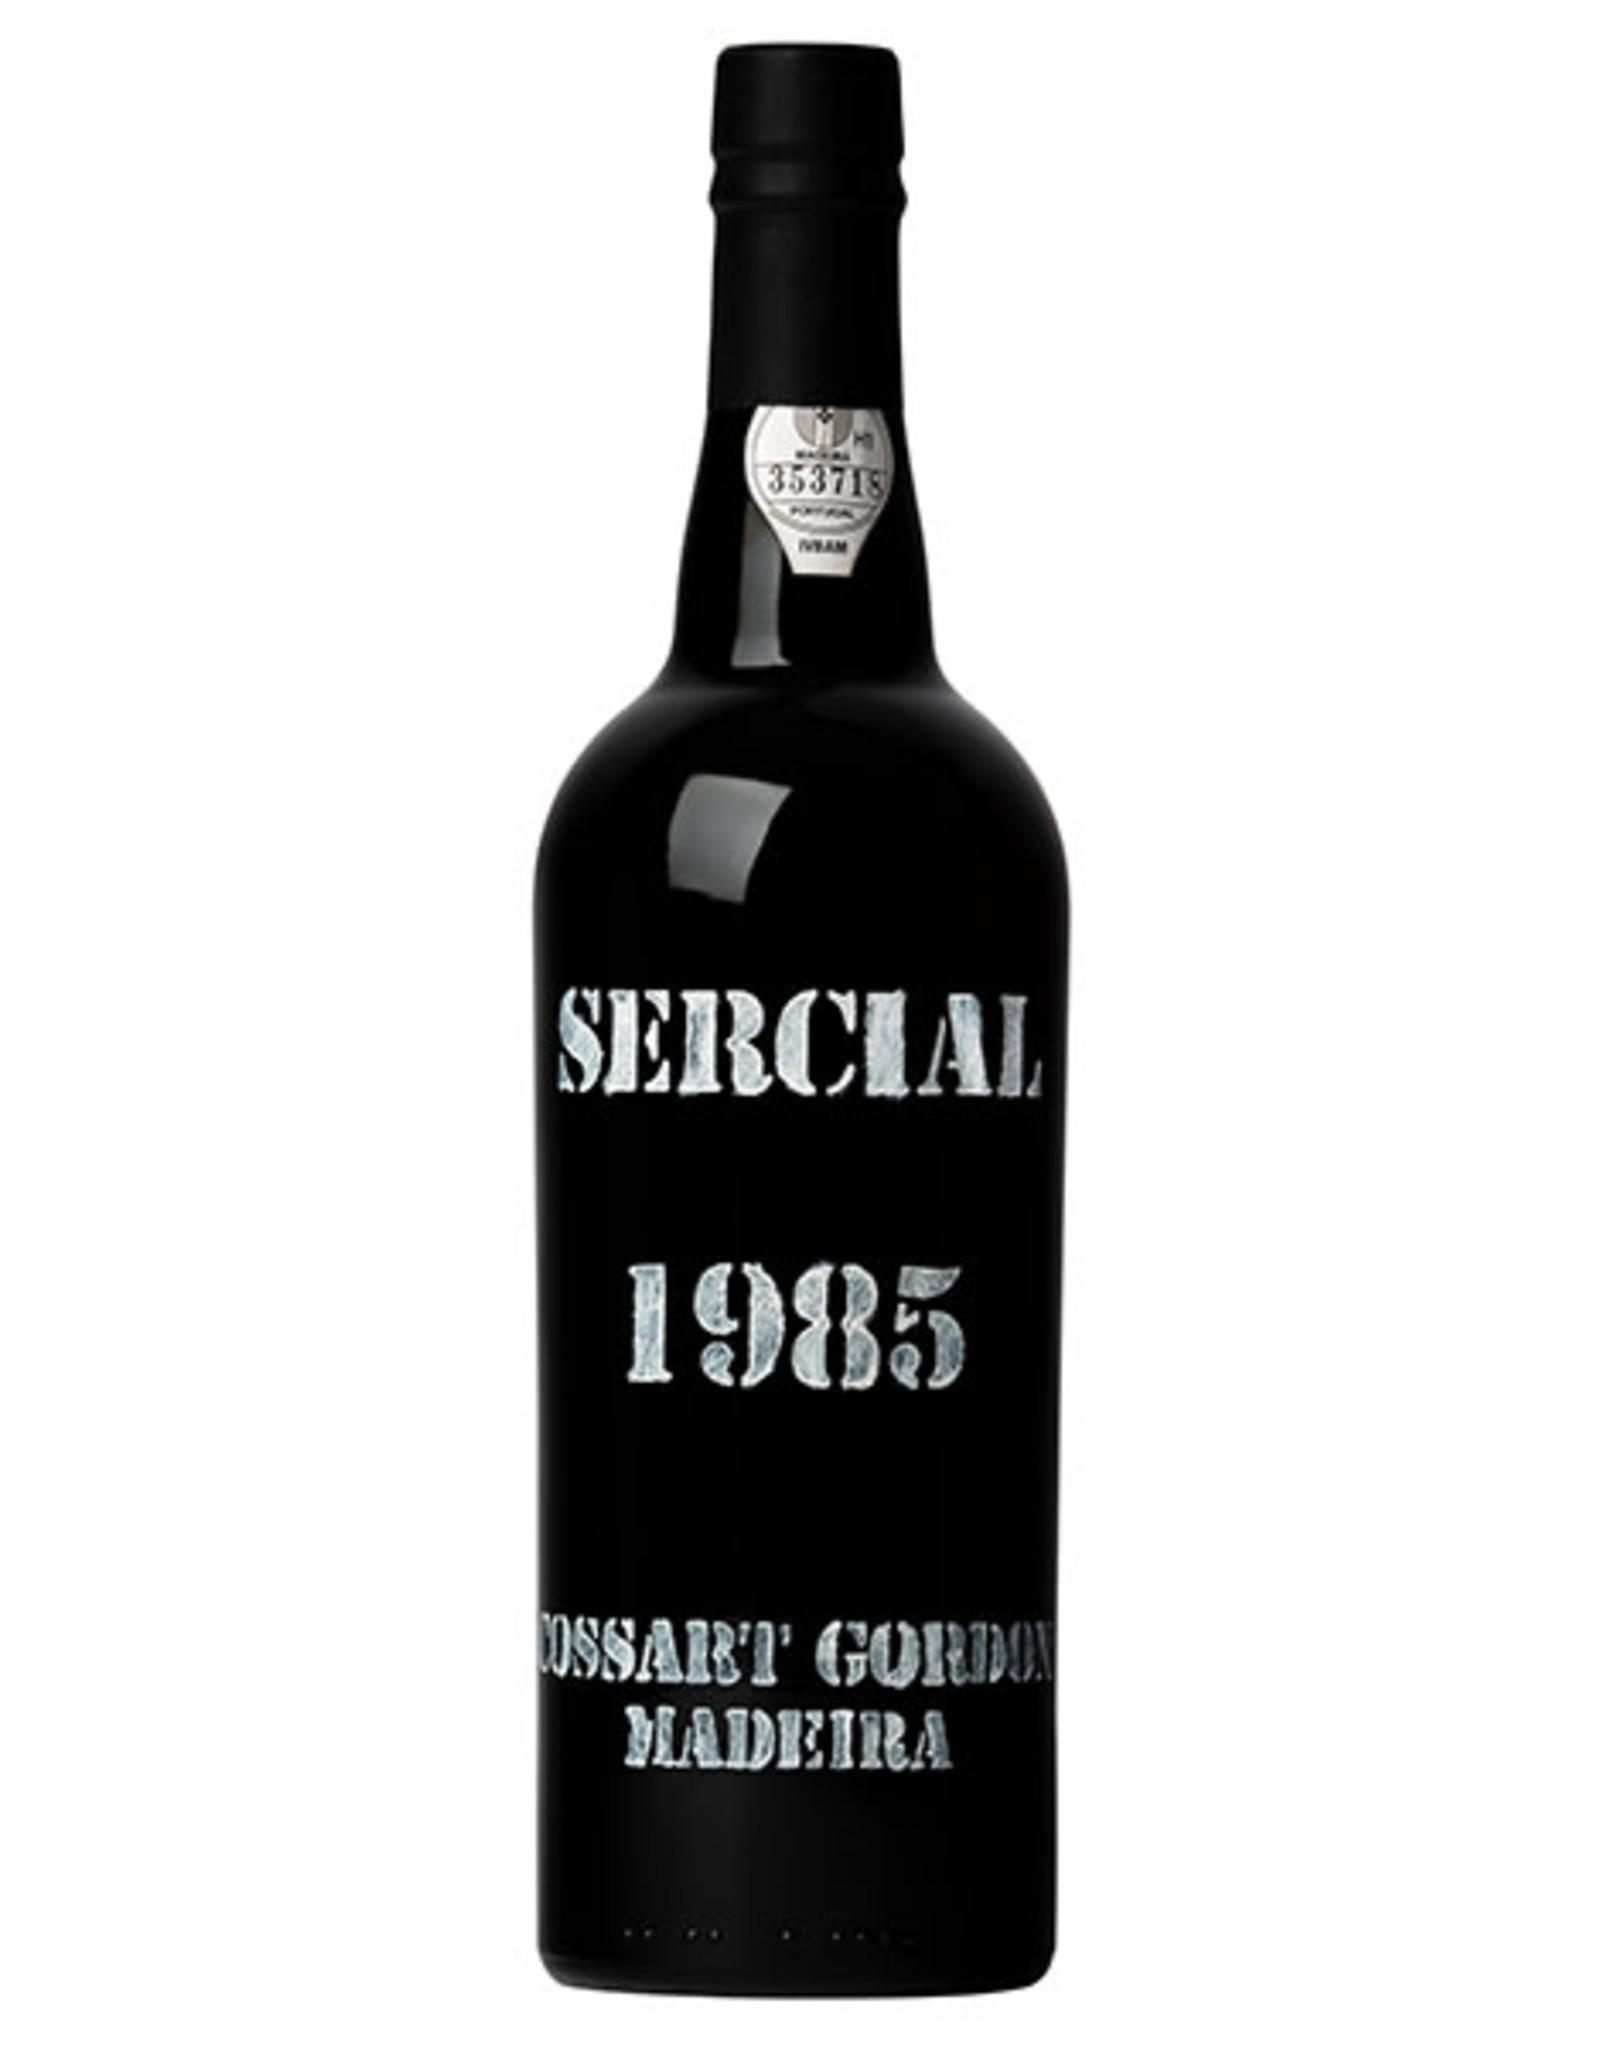 Cossart Gordon Sercial Madeira 1985